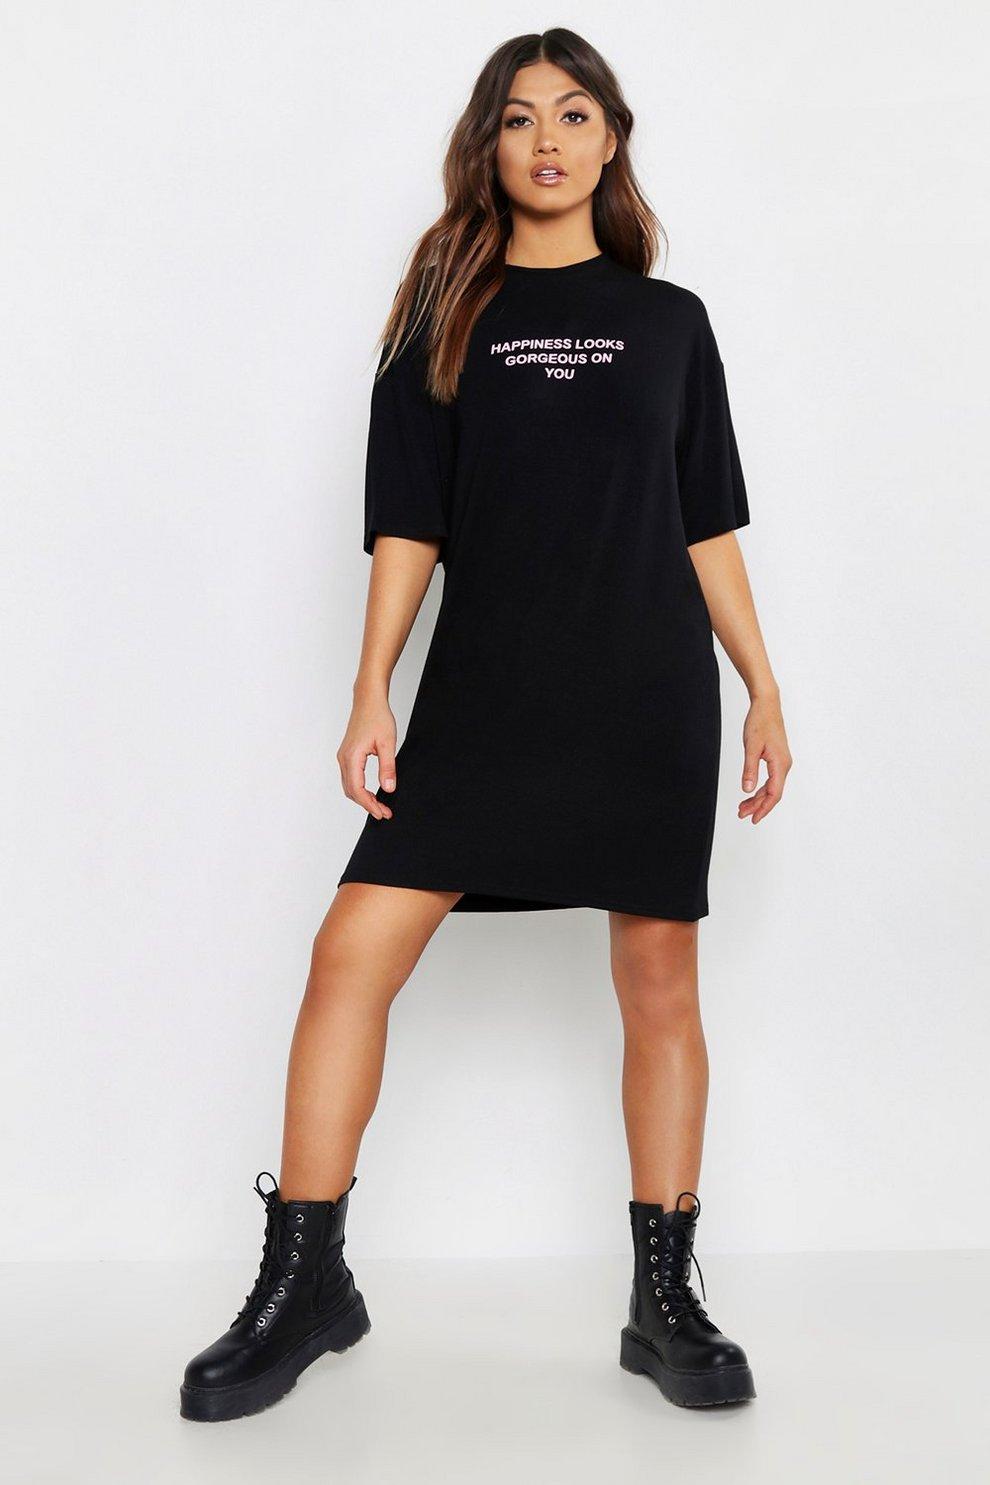 35abcd0a1 Happiness Looks Good T-Shirt Dress   Boohoo